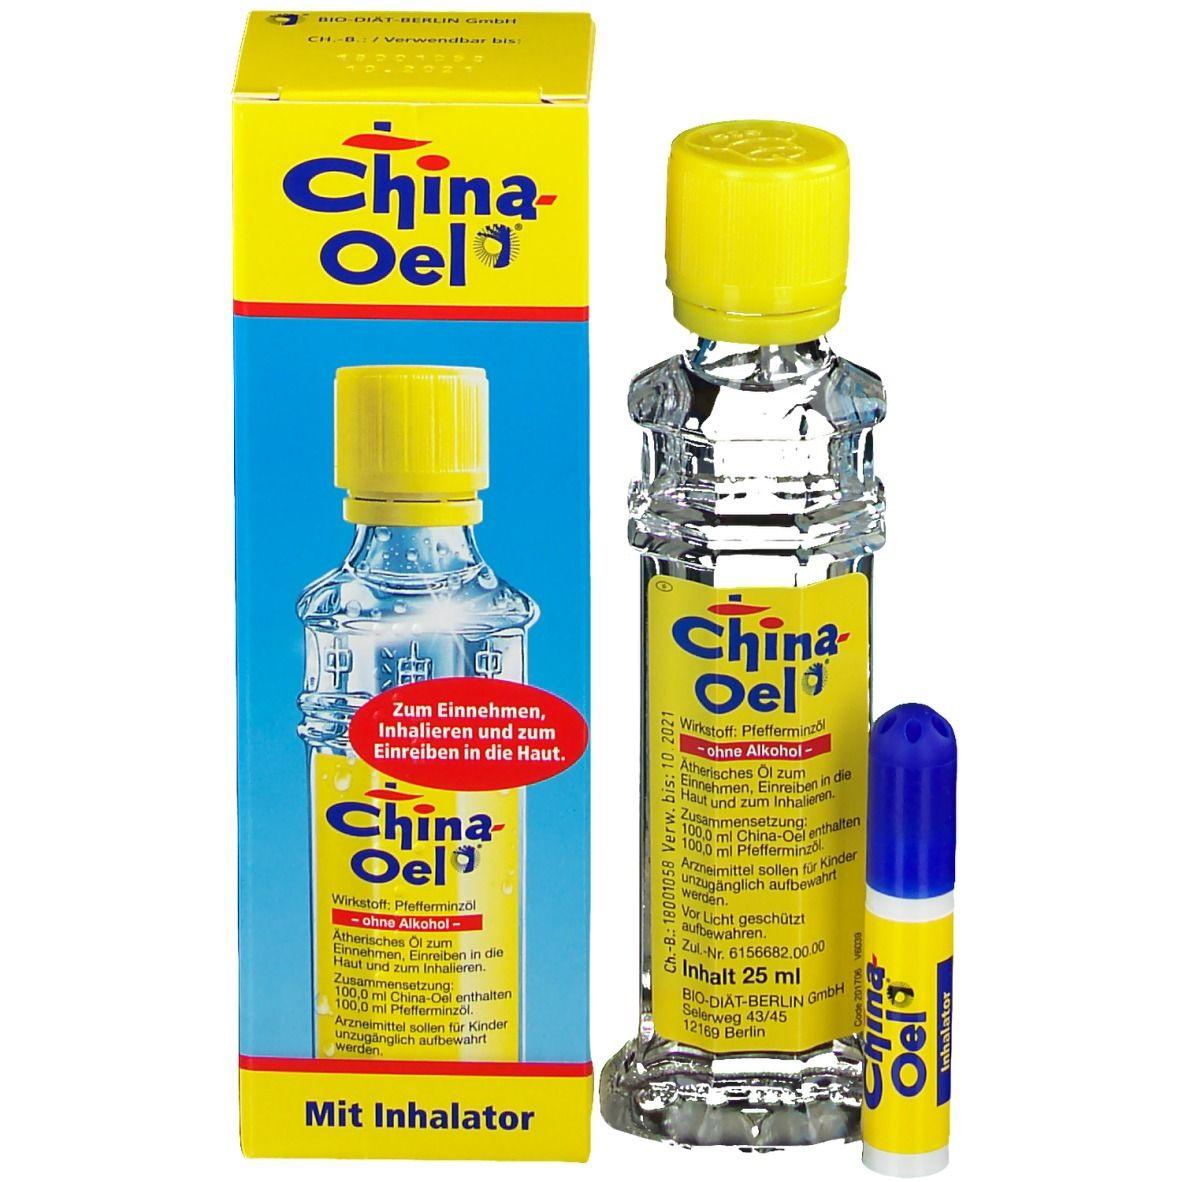 China-Oel® mit Inhalator